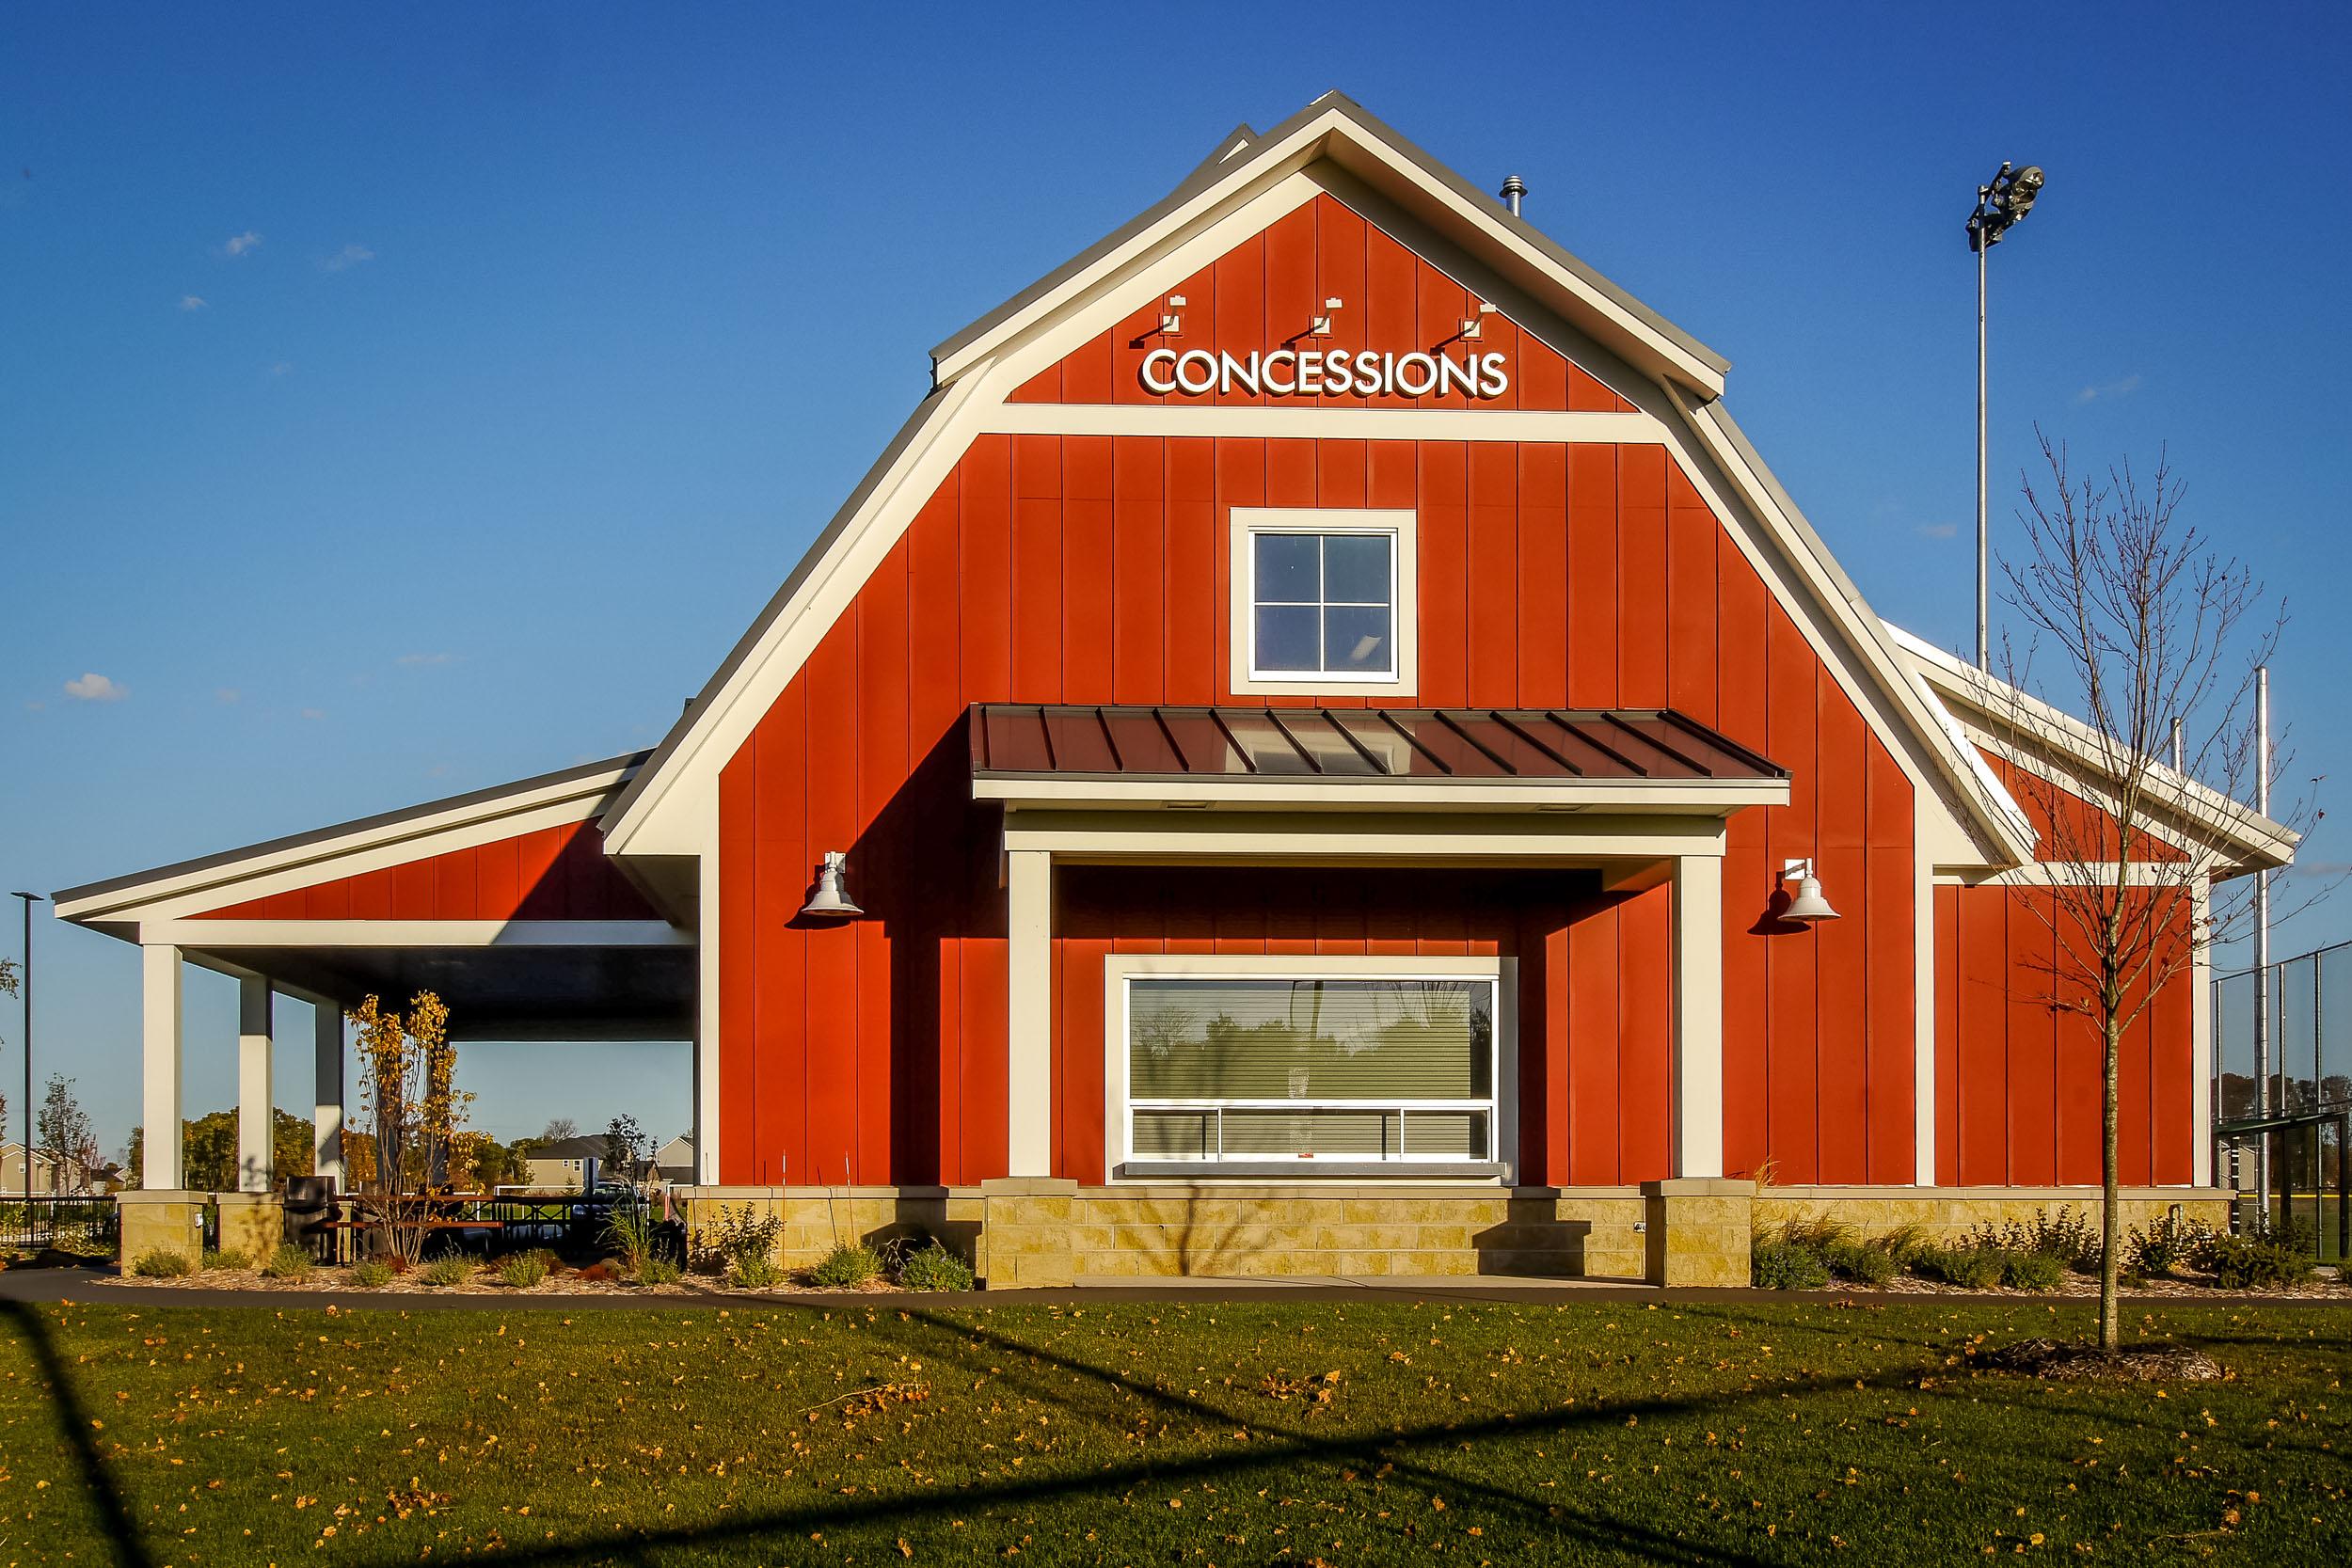 Concessions Building Exterior Image